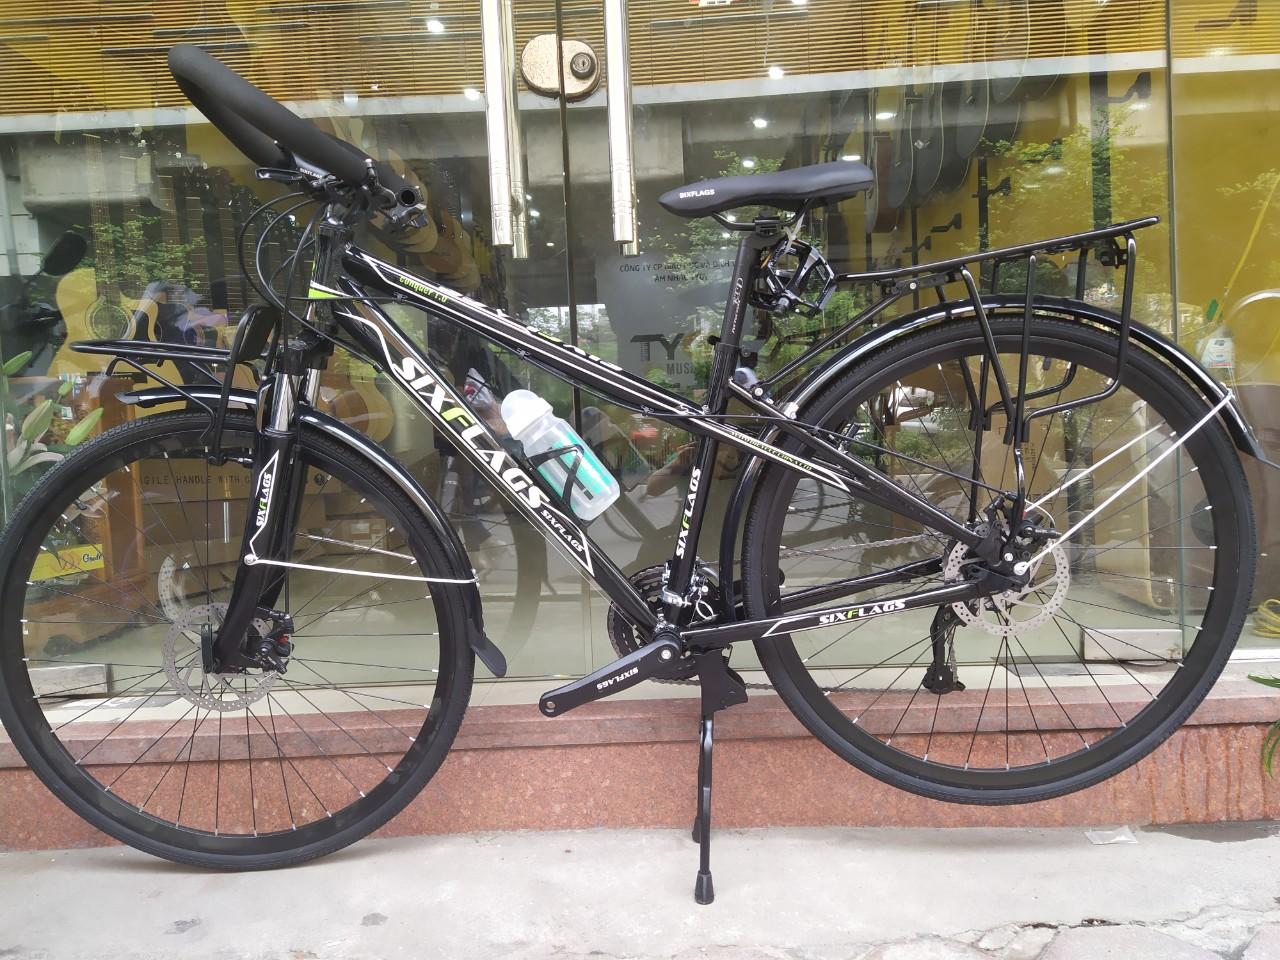 xe đạp SIXFLAGS- conpuer 1.0